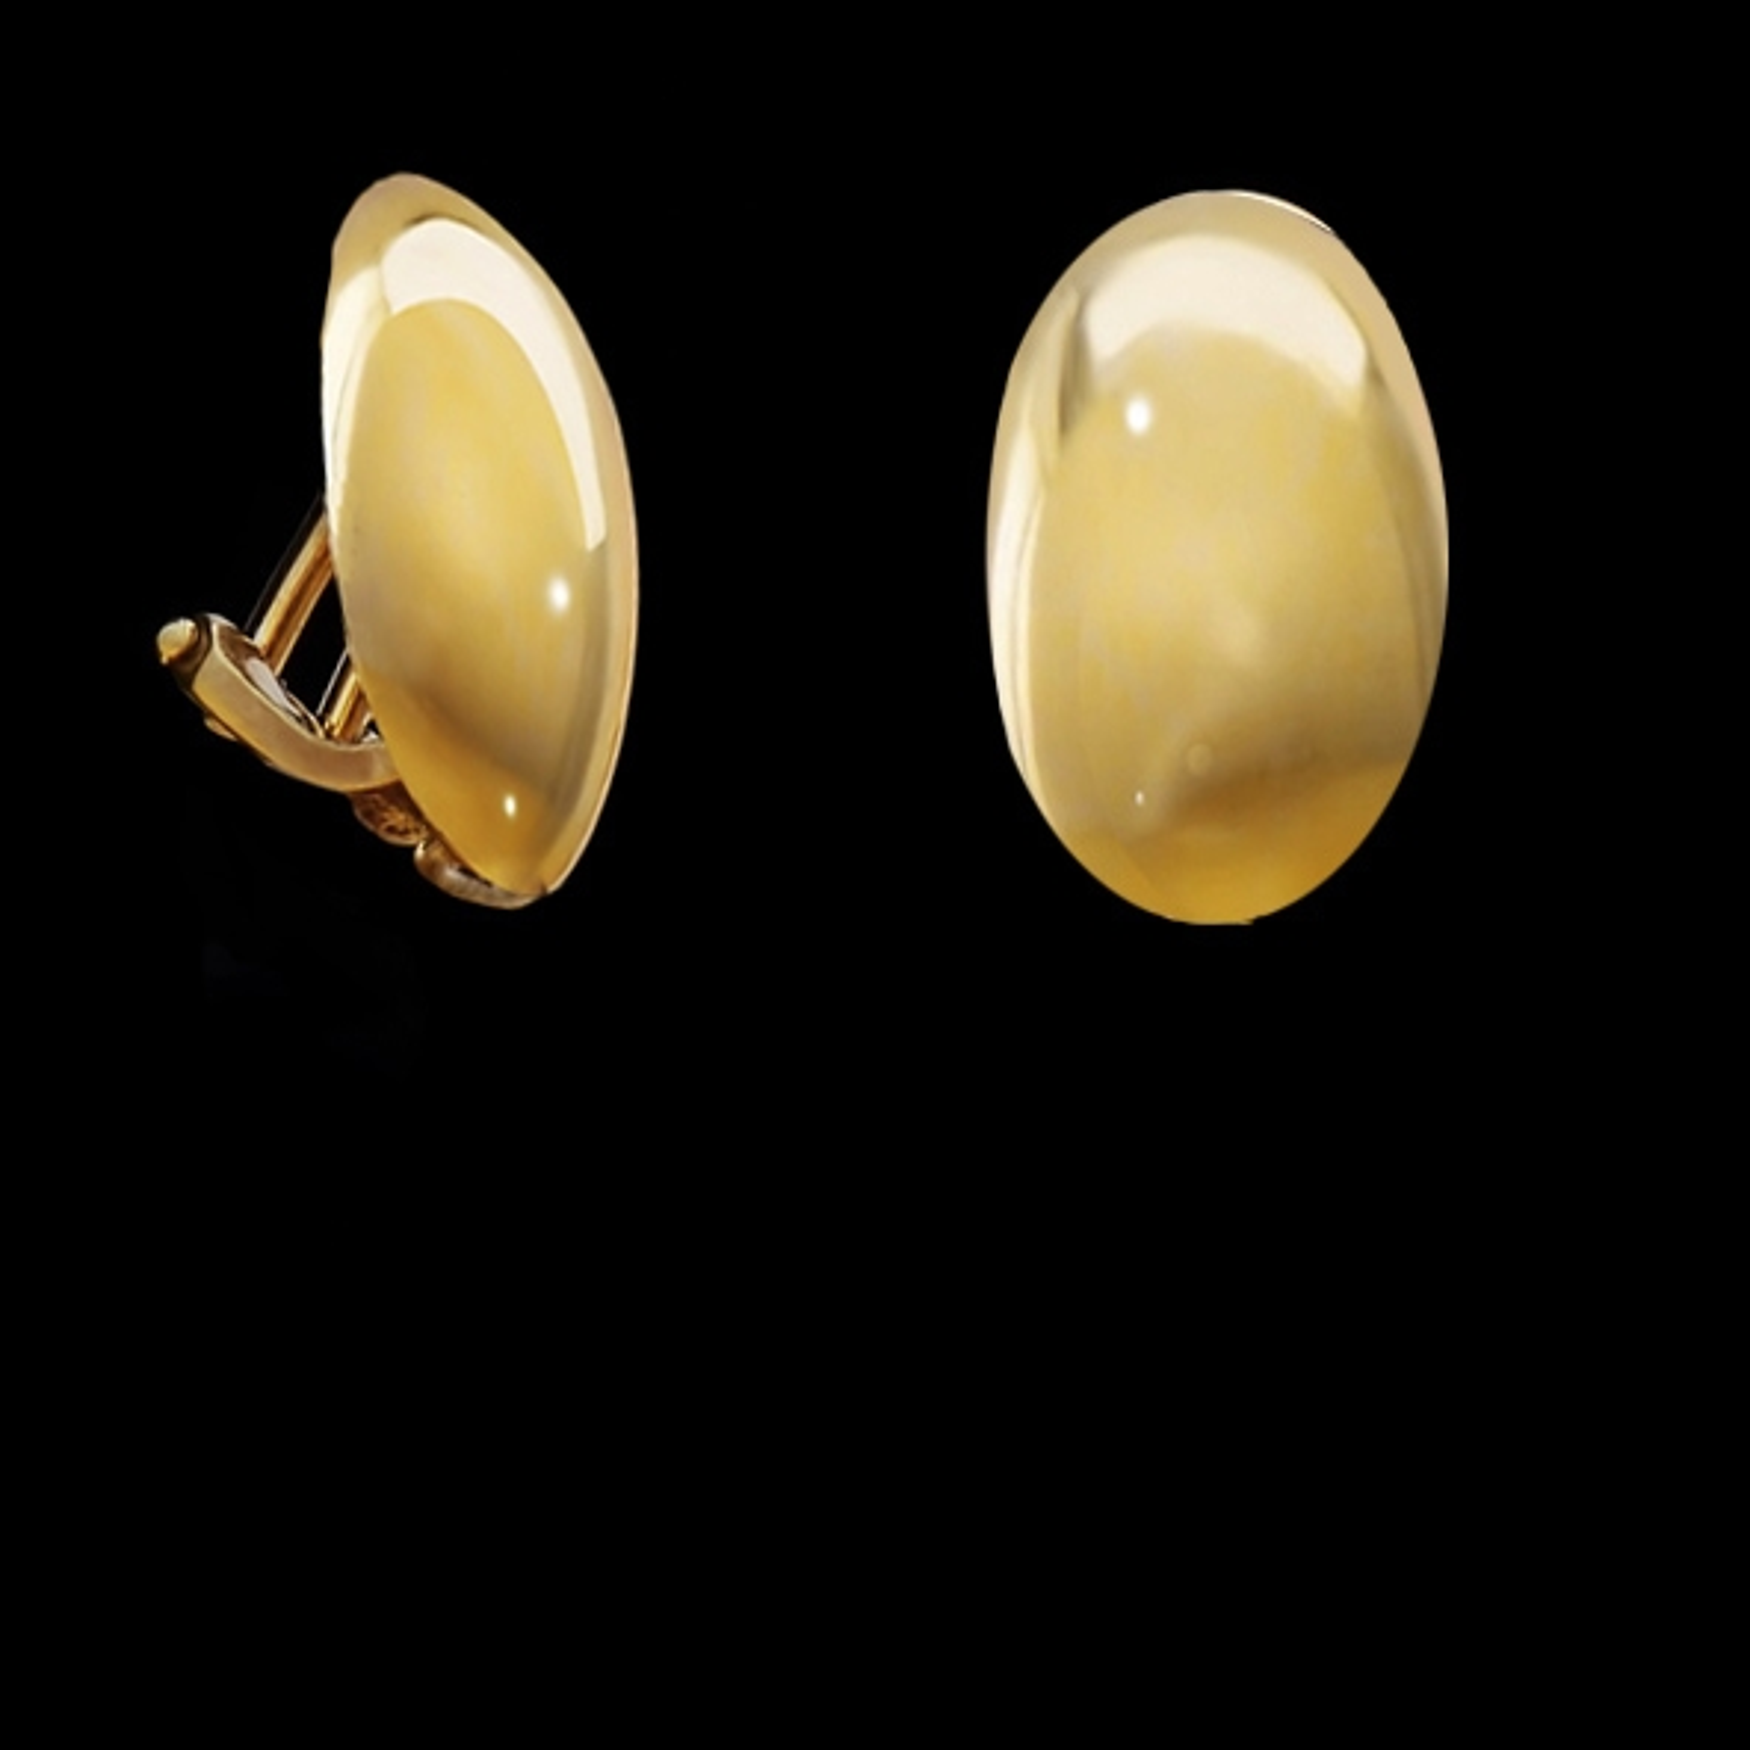 Ohrclip - oval, gold